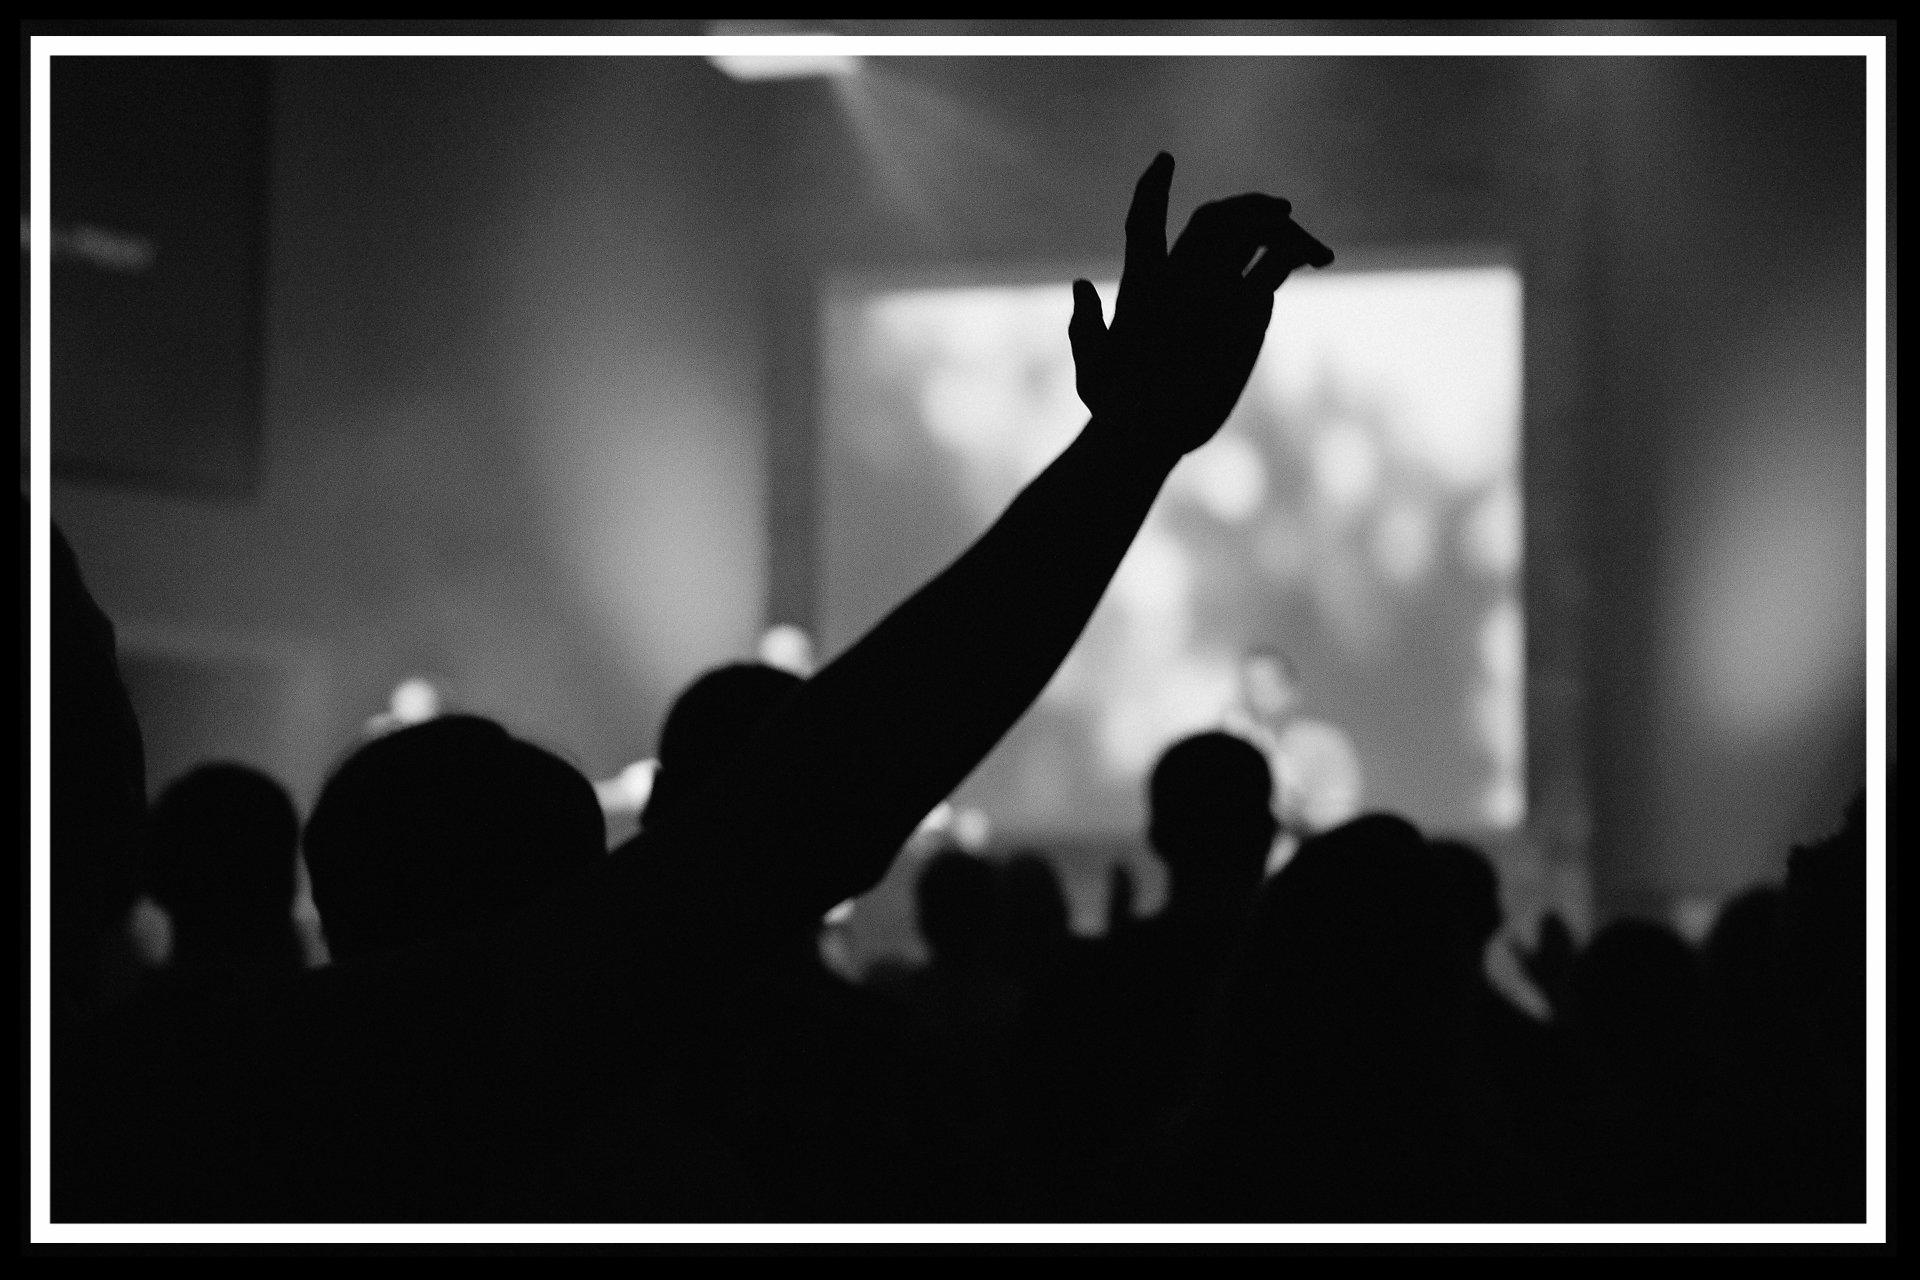 28028_42885_Worship.jpg